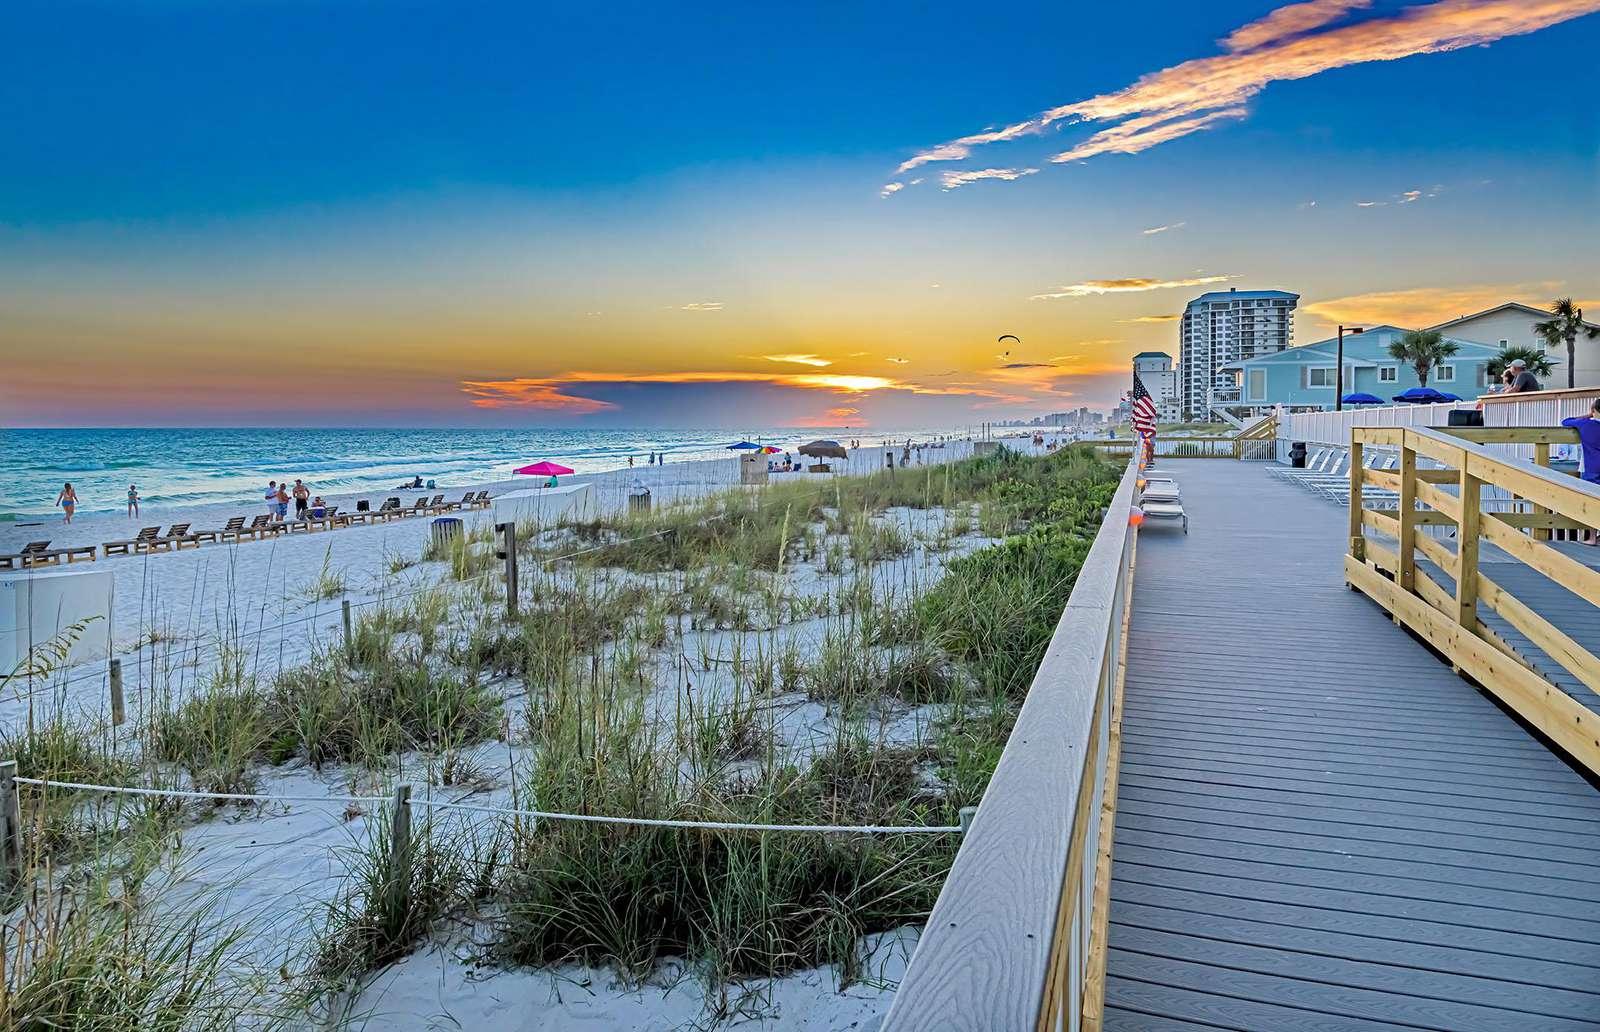 Catch a STUNNING sunset at the beach!